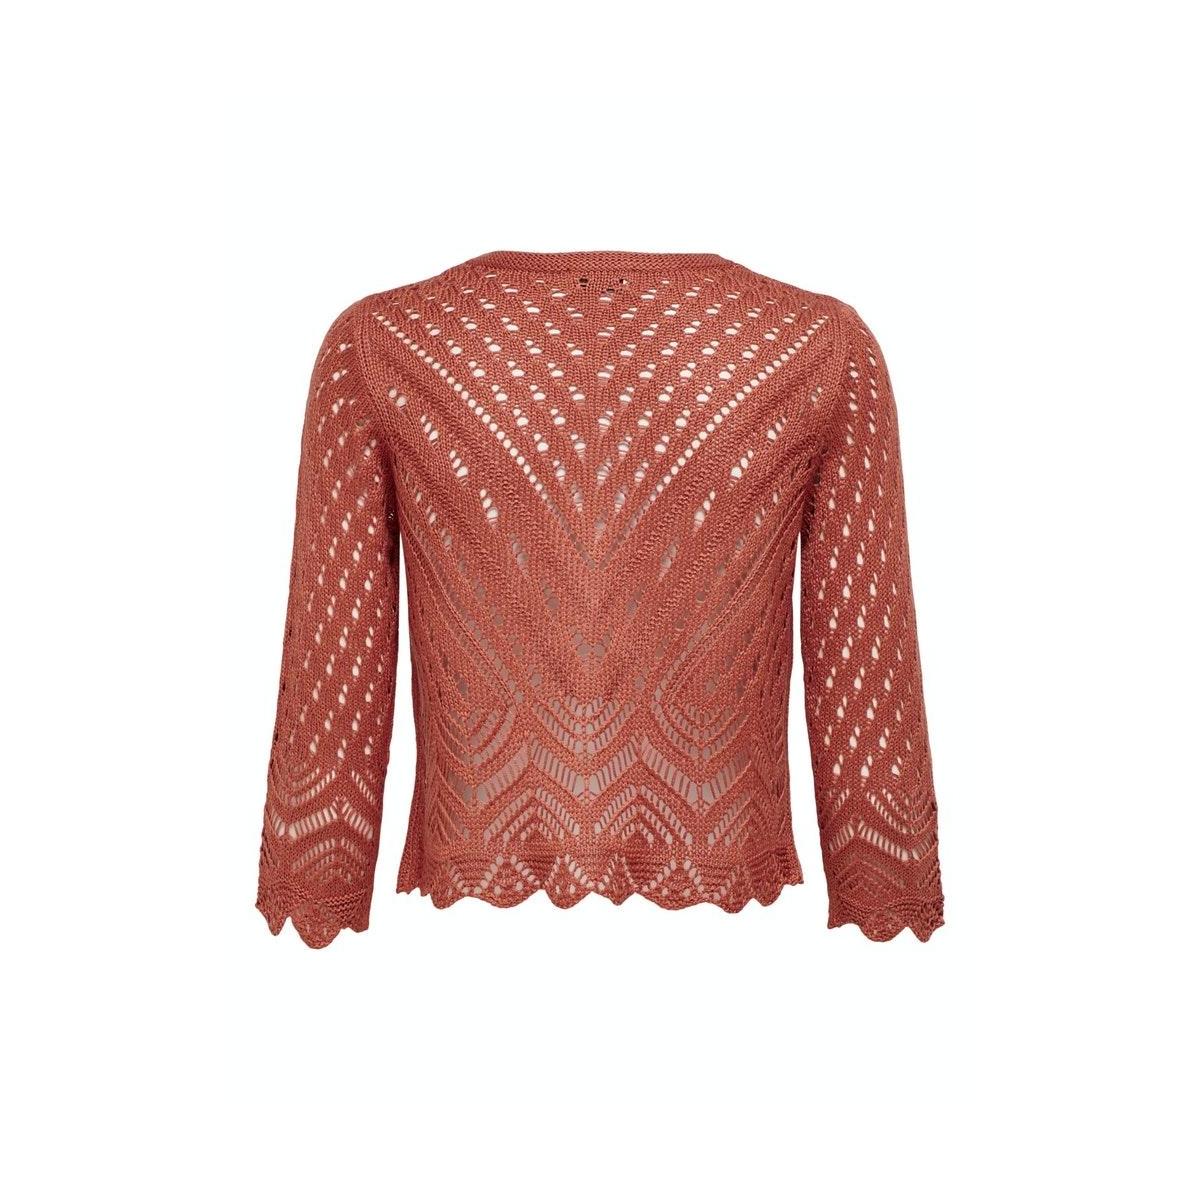 jdysun 3/4 cropped cardigan knt 15184486 jacqueline de yong vest bruschetta